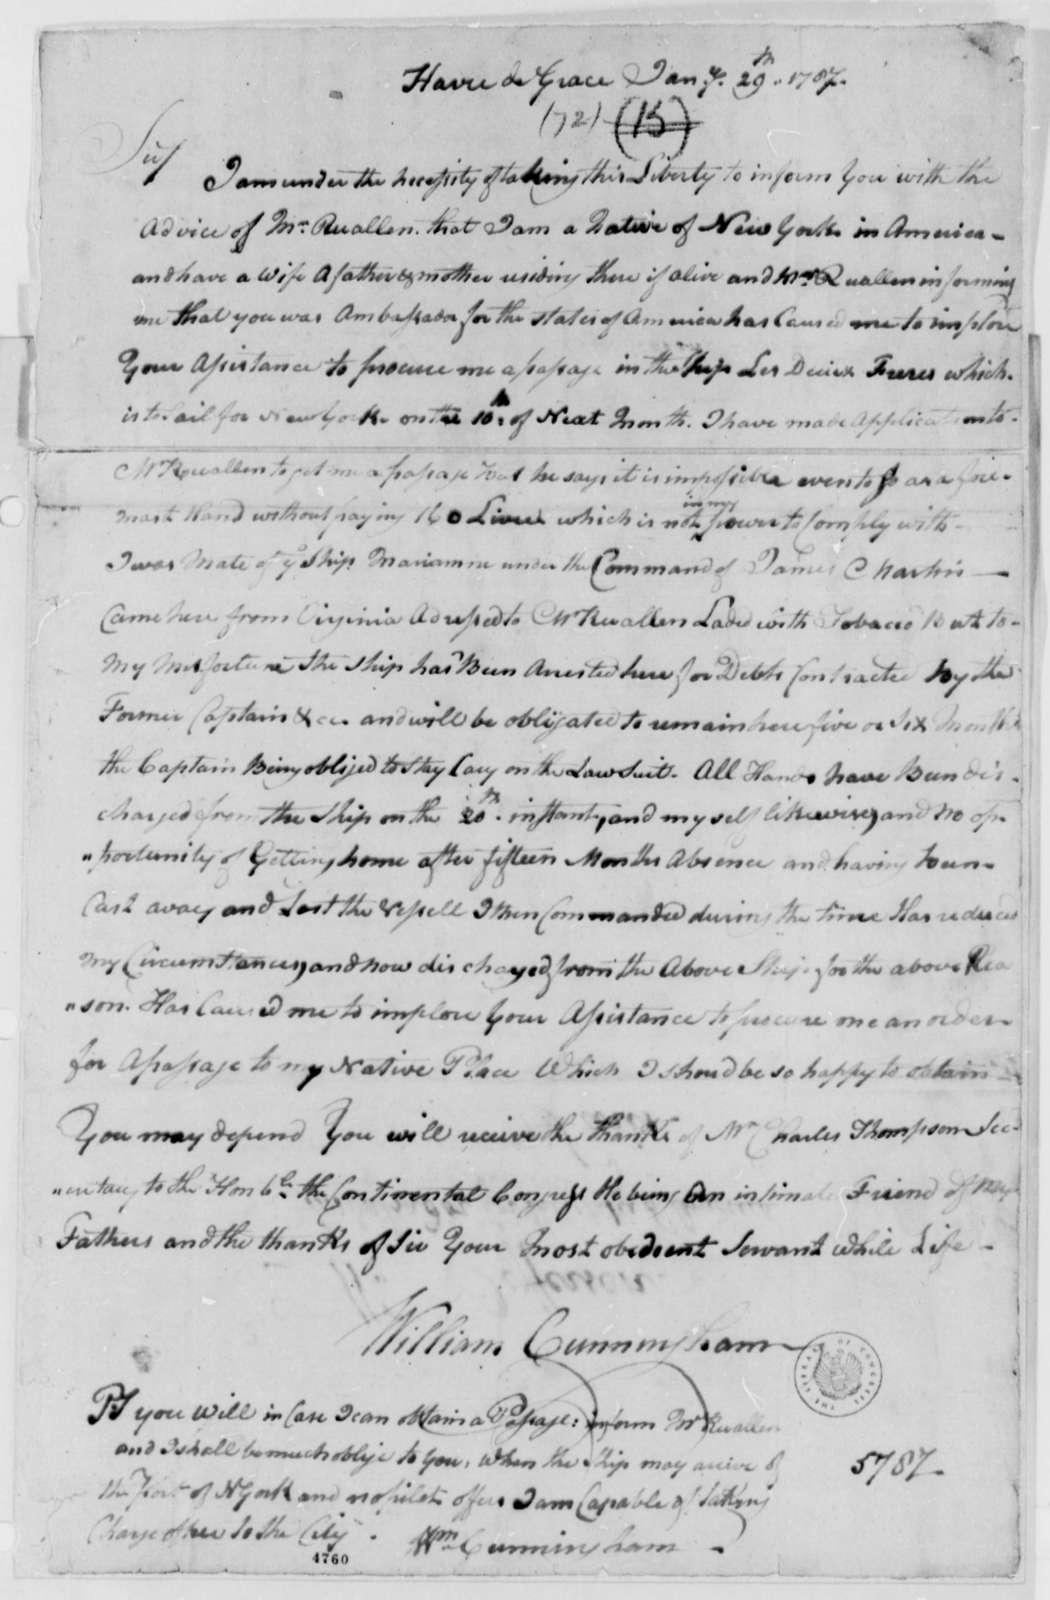 William Cunningham to Thomas Jefferson, January 29, 1787